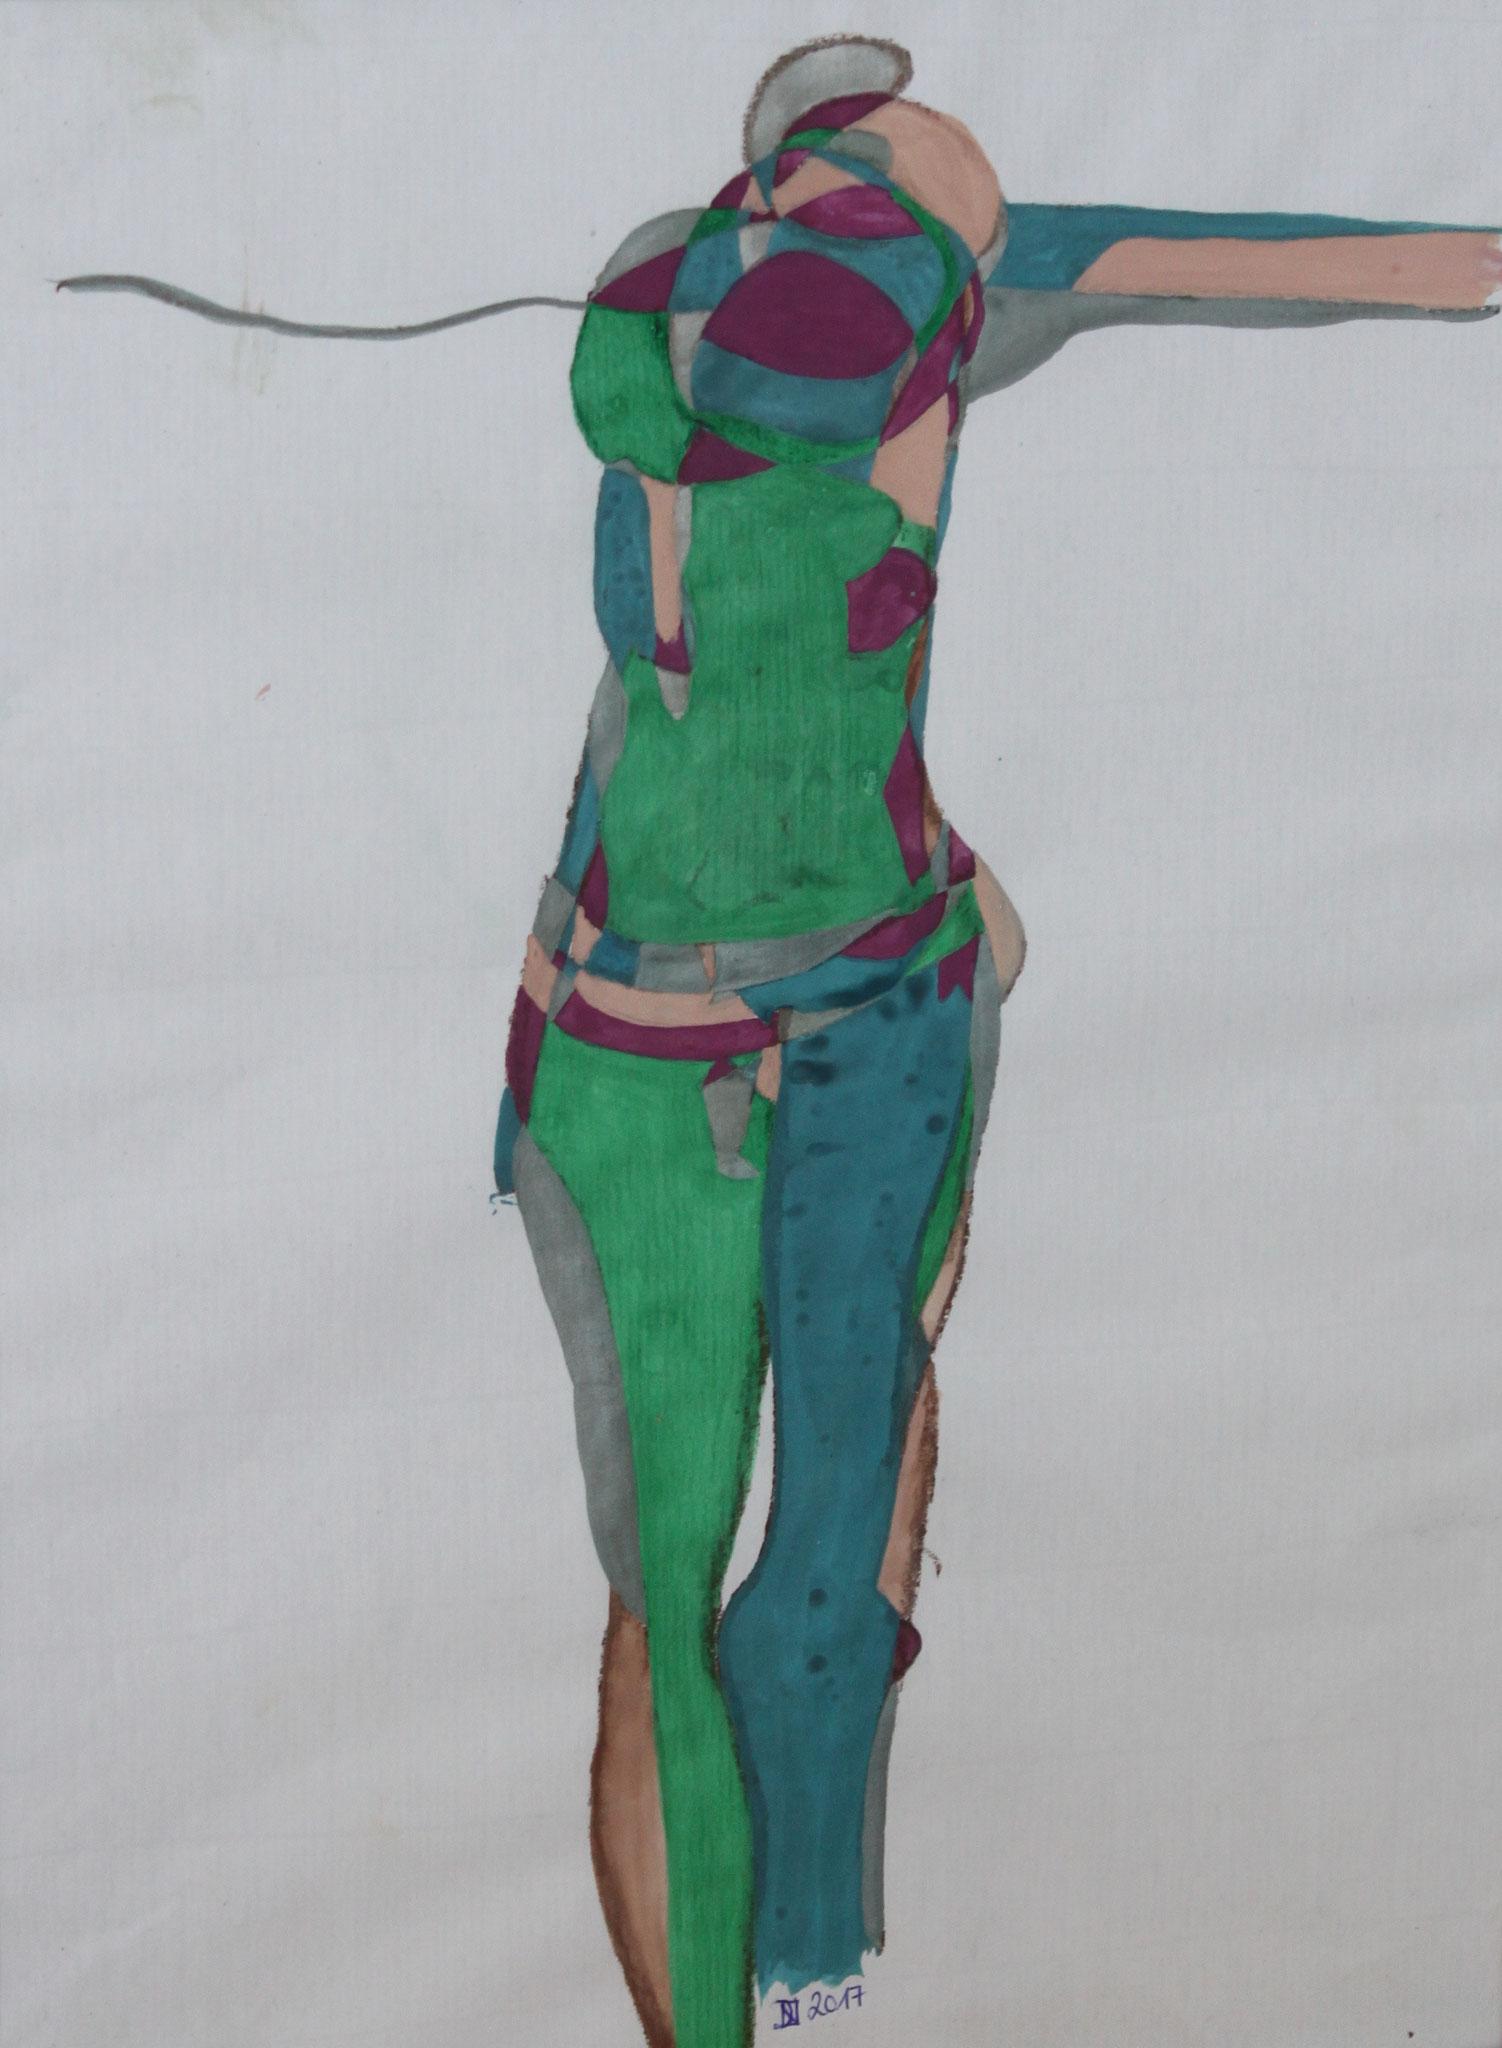 Am Kreuz, Aquarell und Buntstift auf Papier, 2017, 42 cm x 29 cm